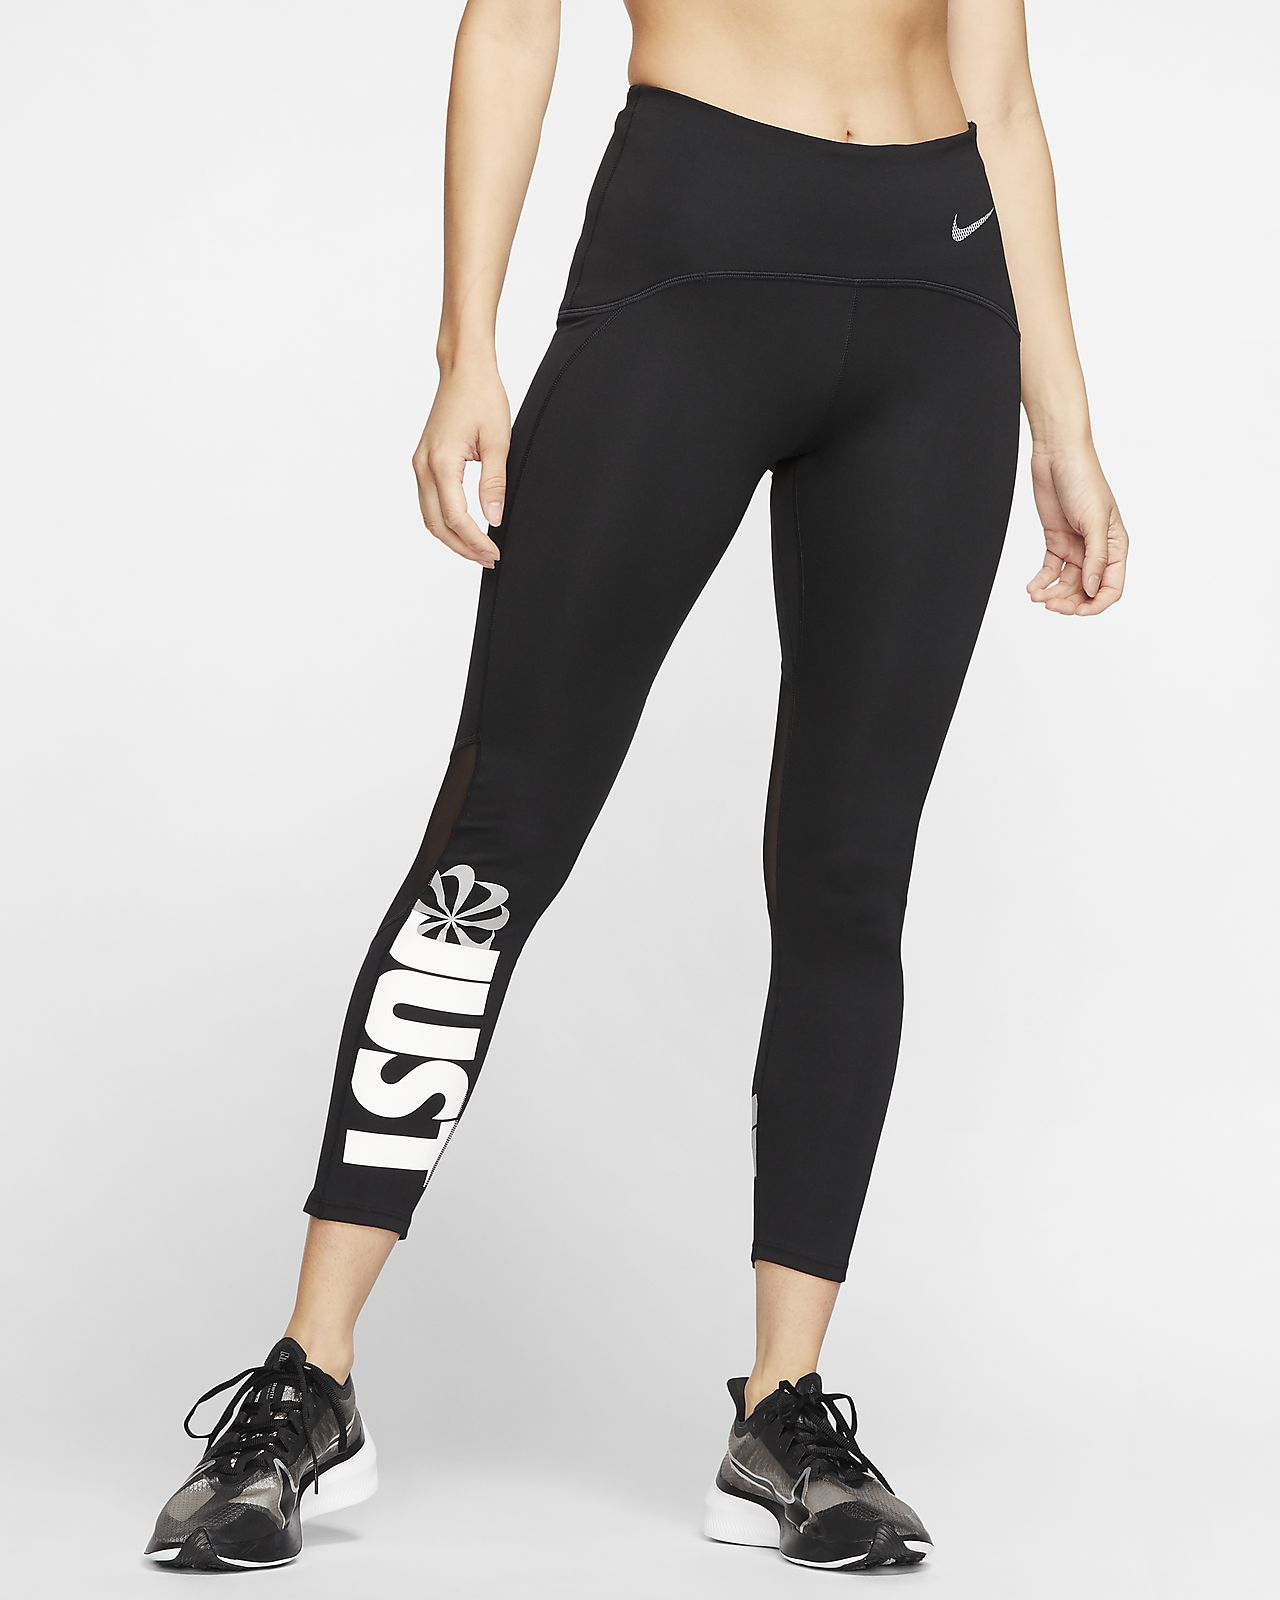 Nike Speed Icon Clash Damen-7/8-Lauftights